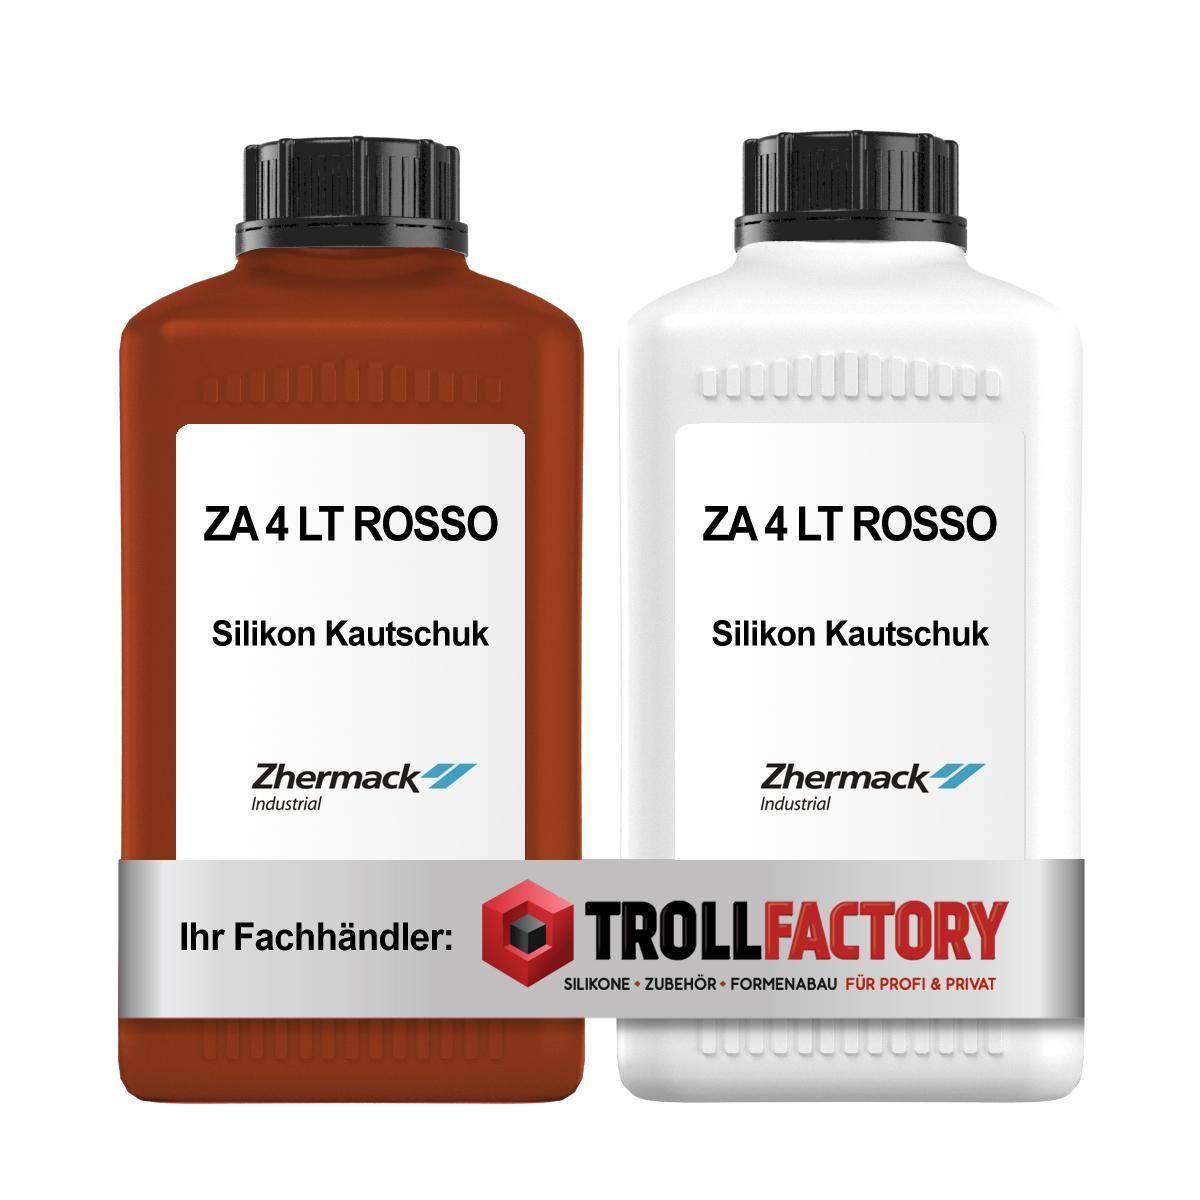 Zhermack Silikon ZA 4 LT ROSSO Shore Härte 4 1+1kg